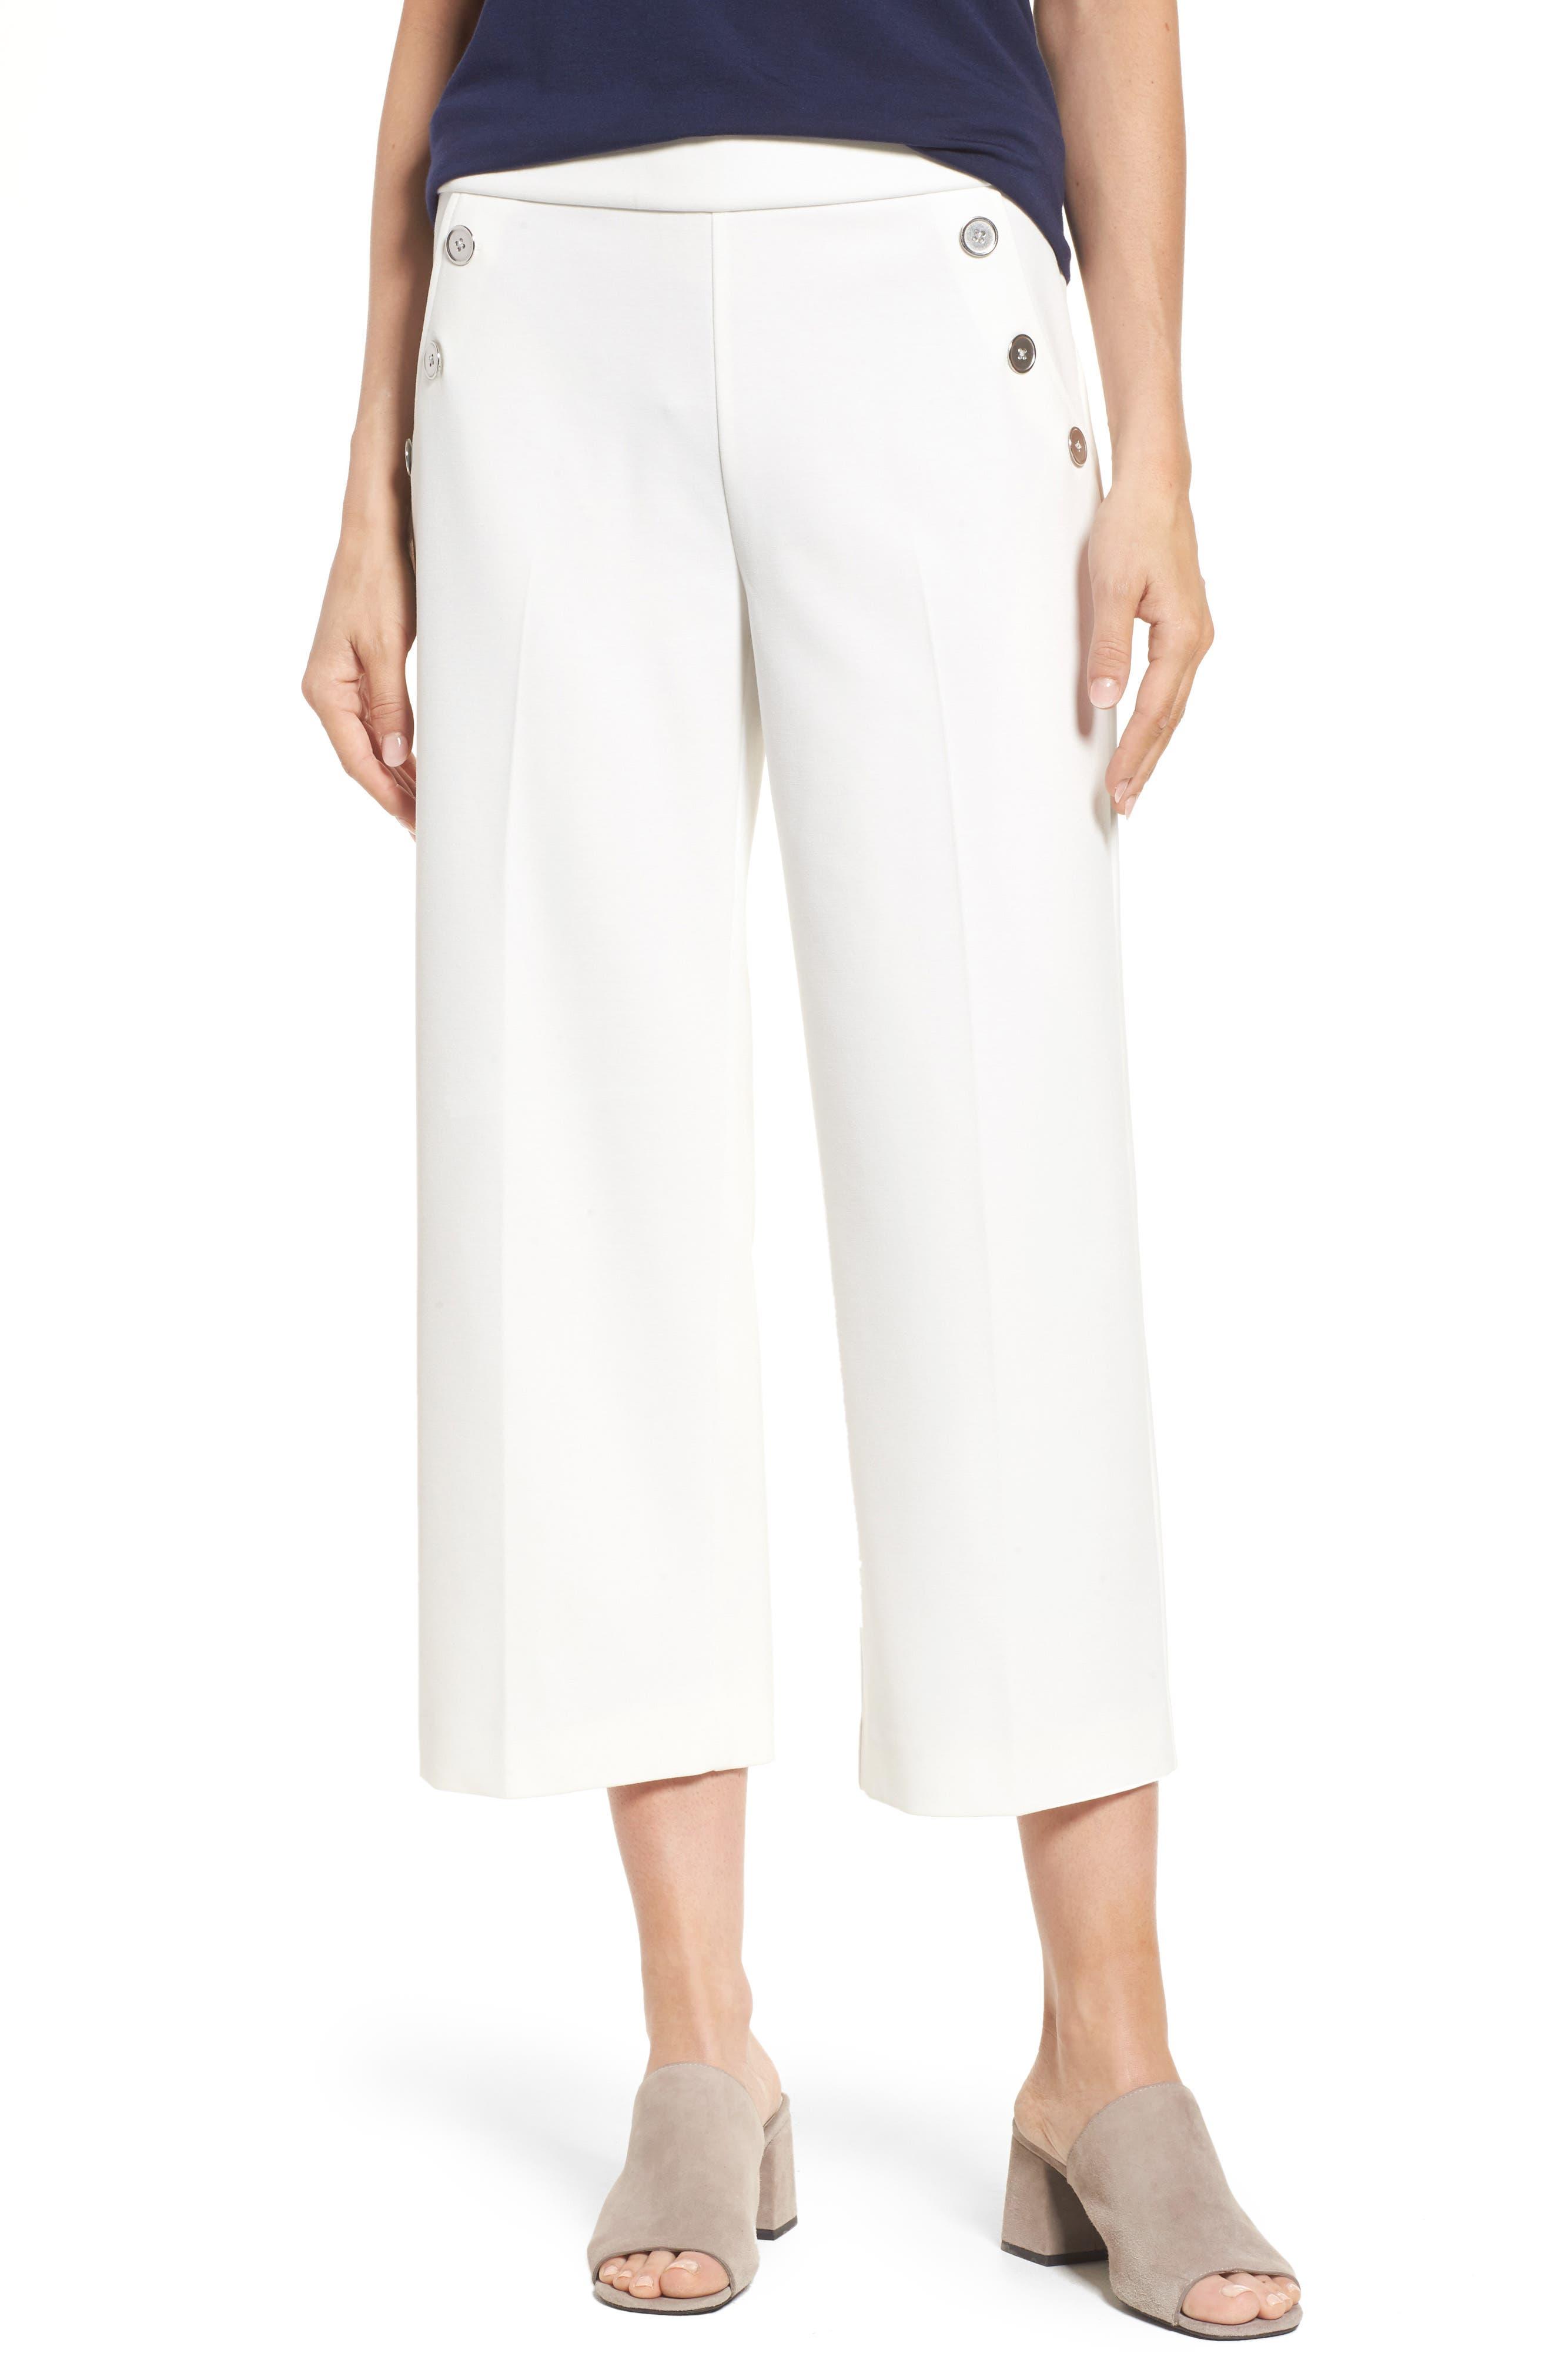 Main Image - Chaus Crop Ponte Knit Sailor Pants